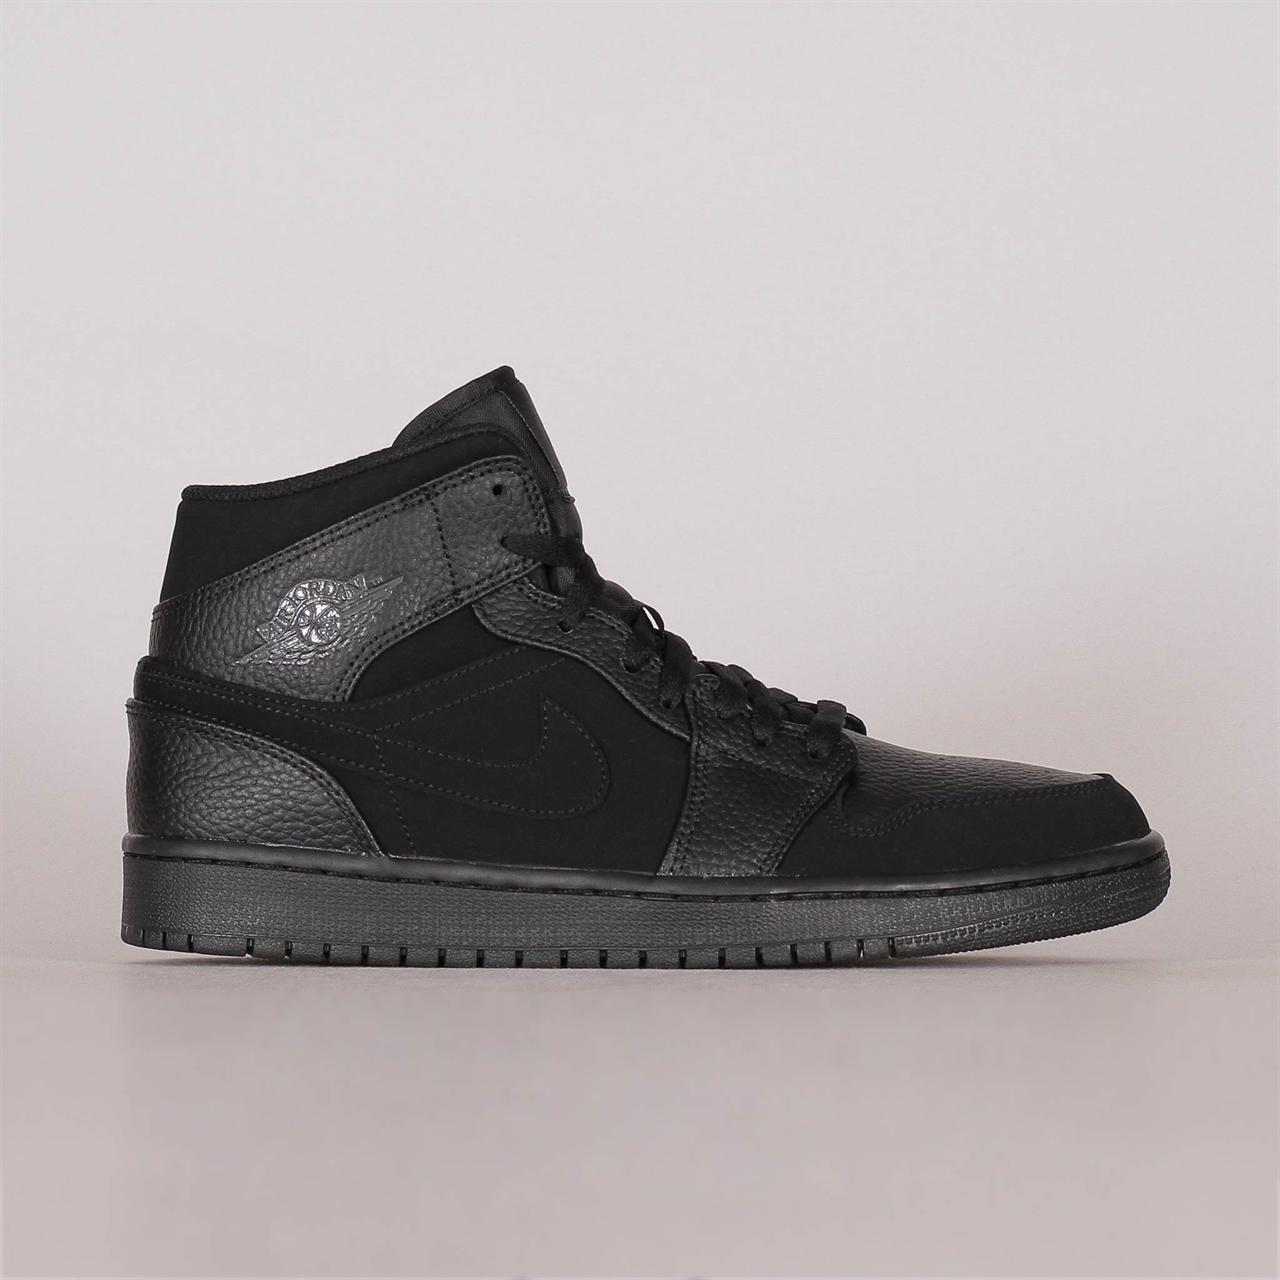 online retailer 2c2a8 e2cc5 Shelta - Nike Air Jordan 1 Mid (554724-064)